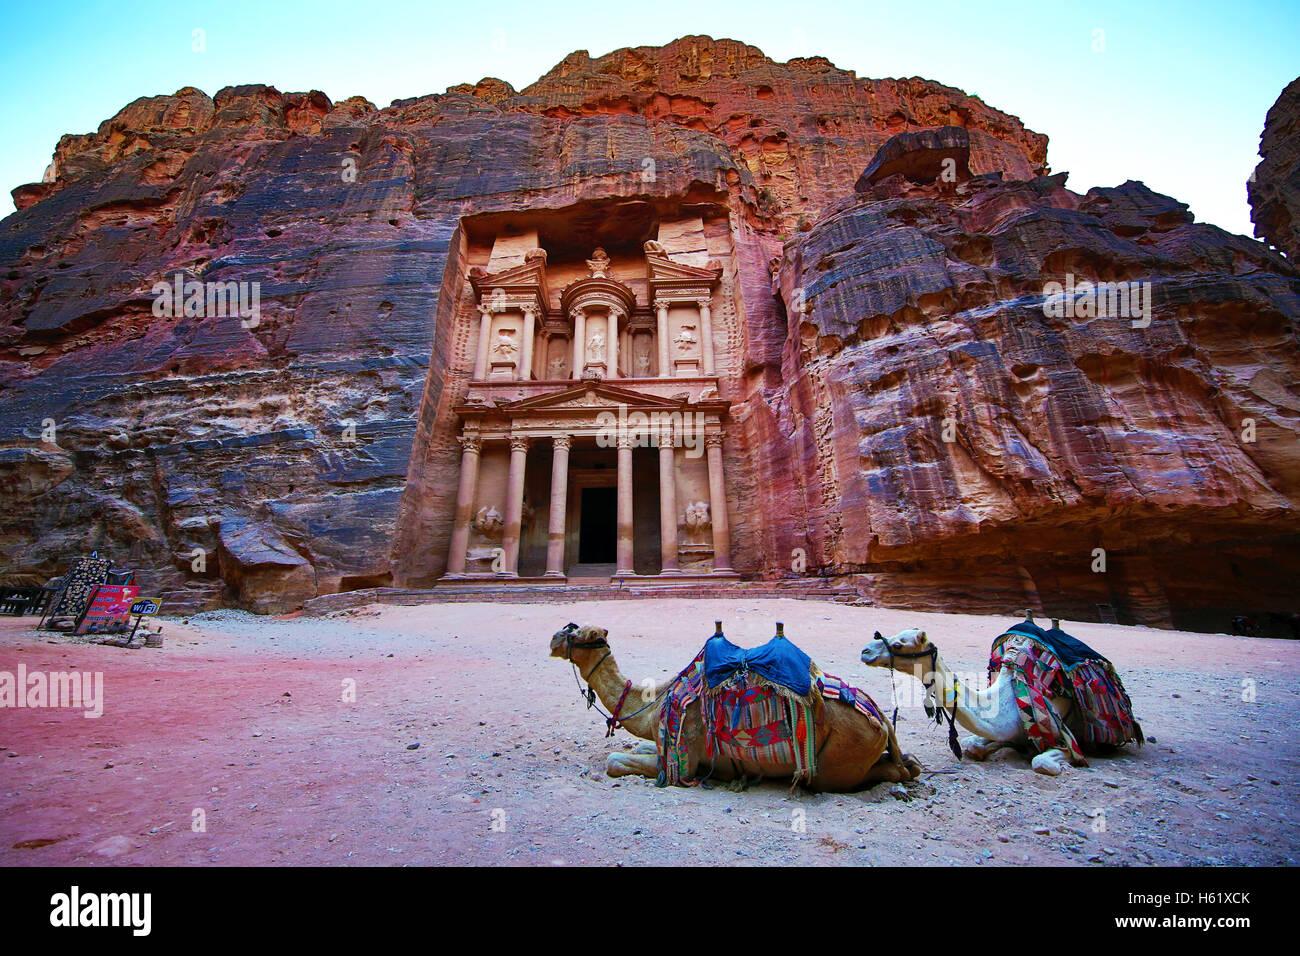 View of the Treasury, Al-Khazneh, with camels, Petra, Jordan - Stock Image